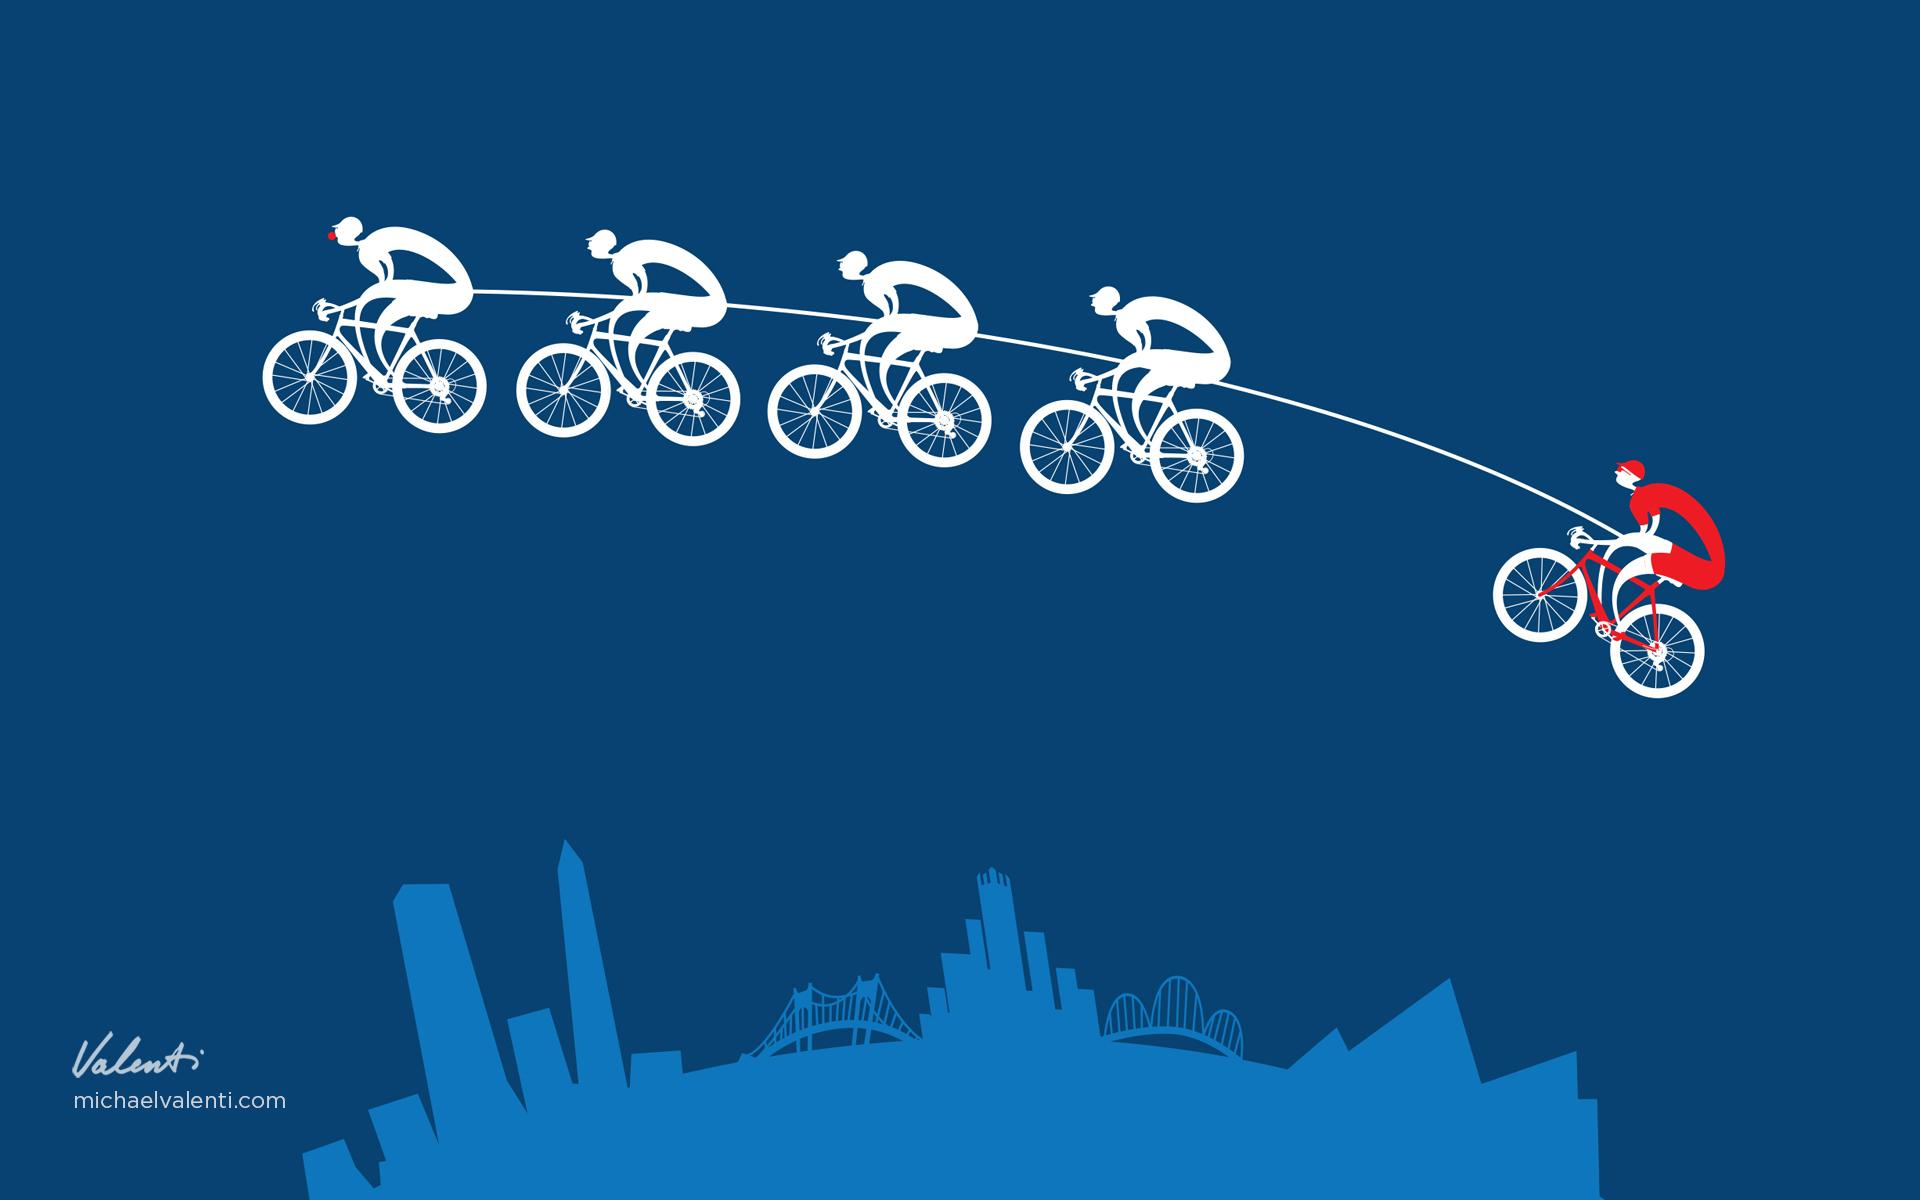 Cycling Wallpaper Bicycle Wallpaper Michael Valenti